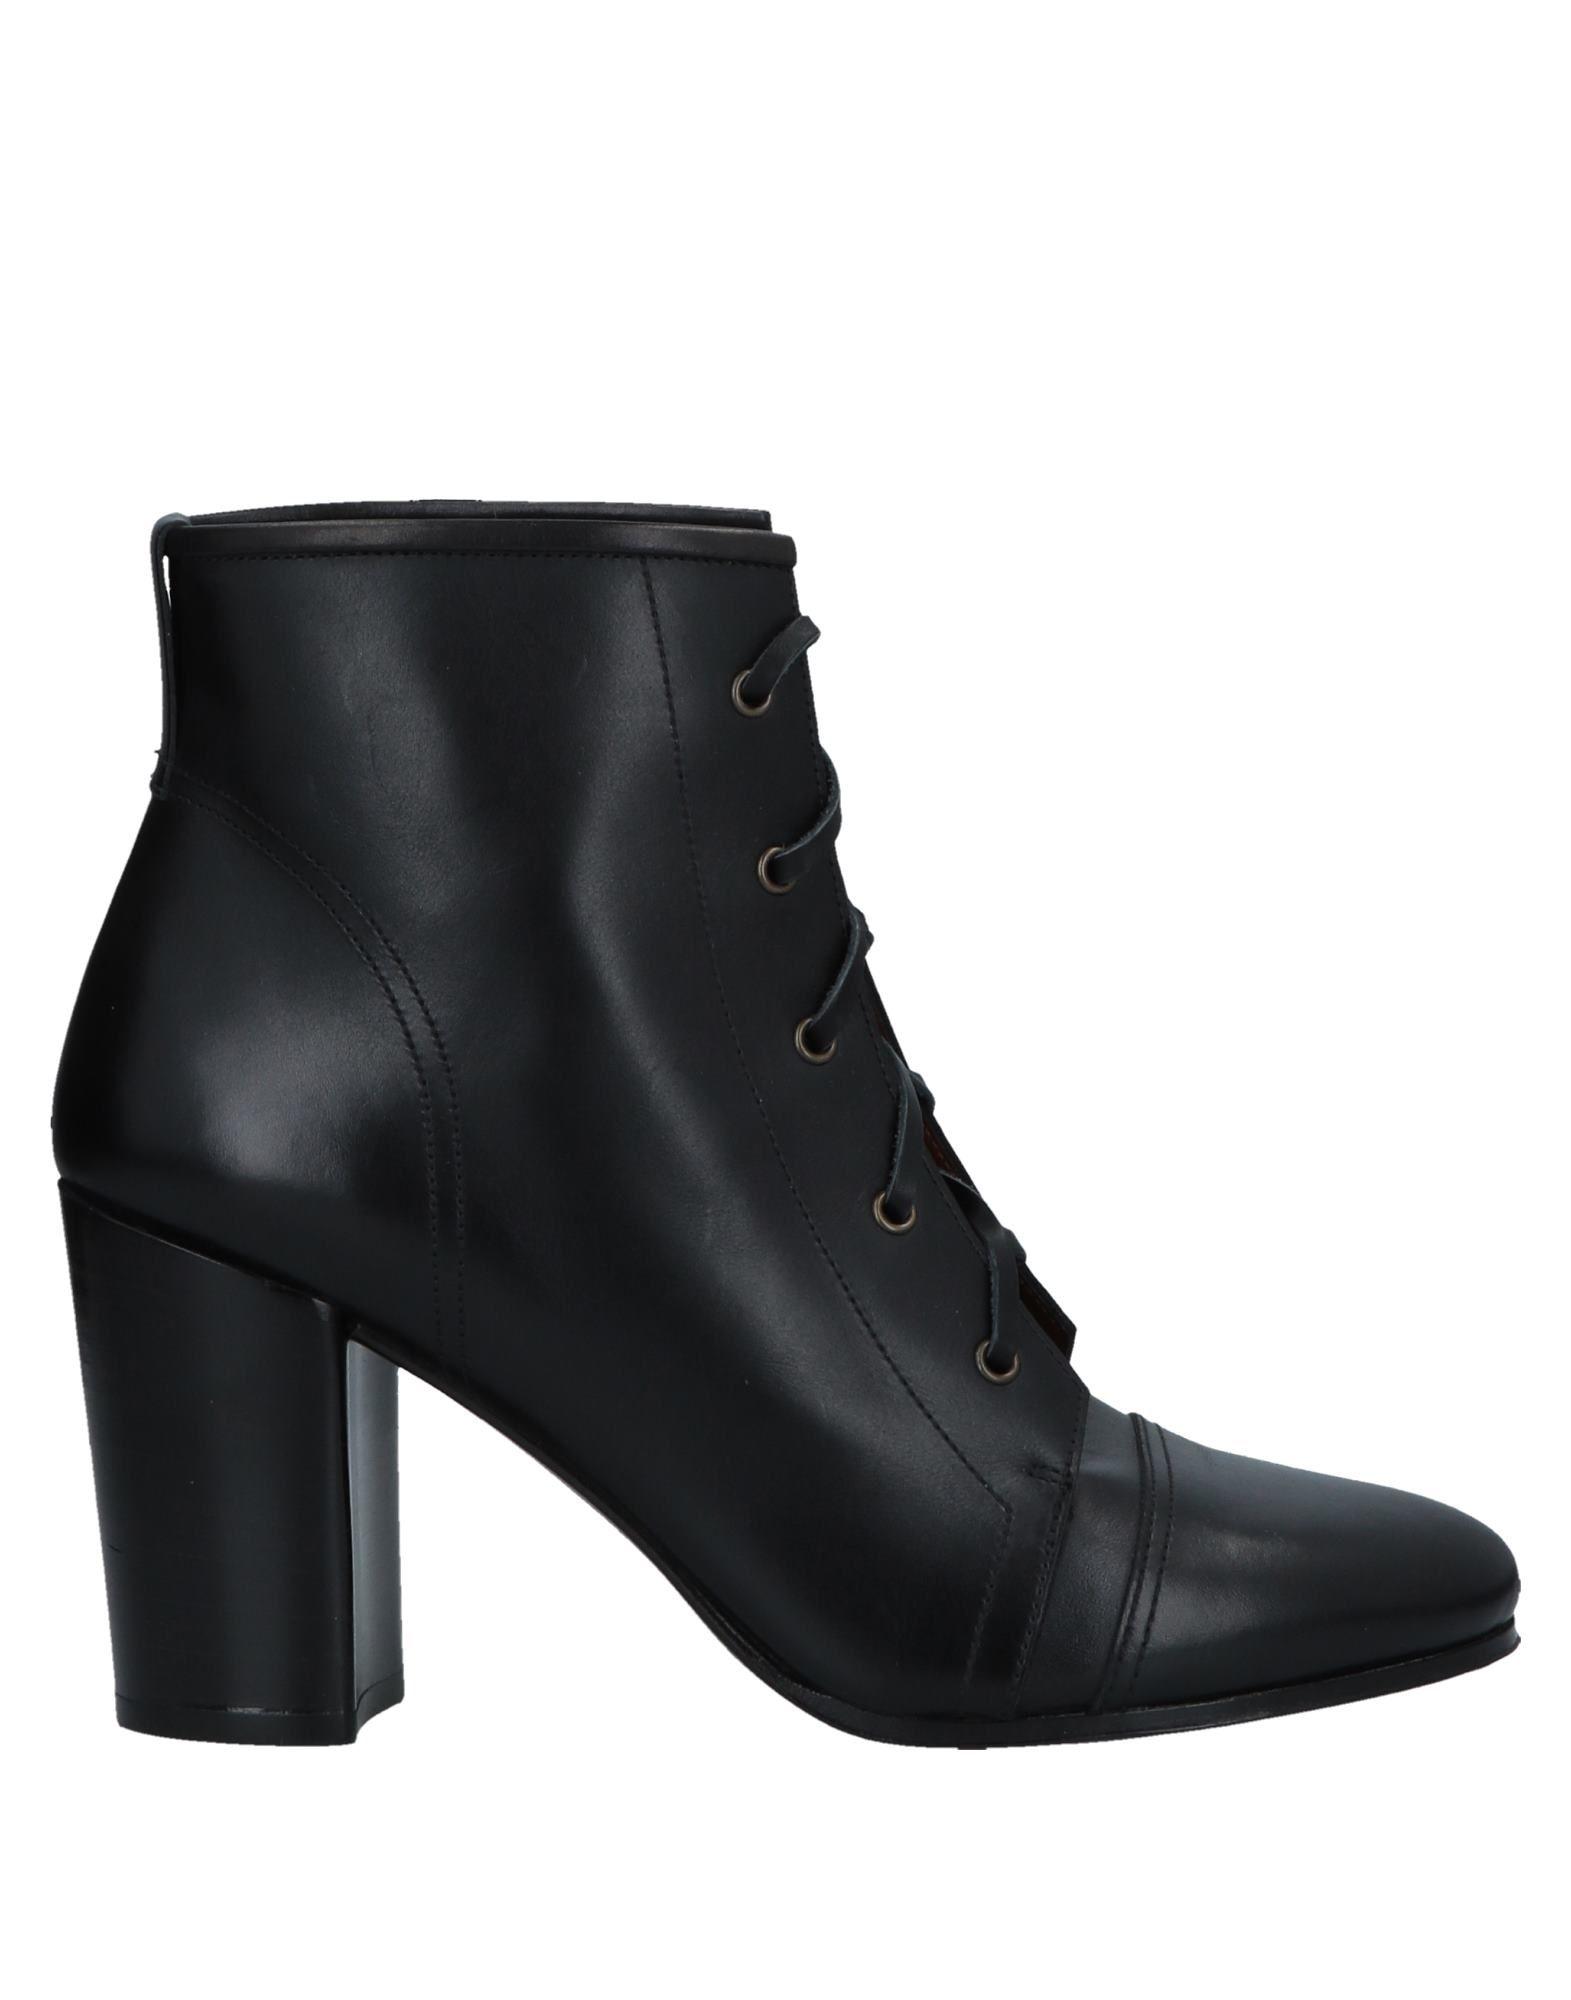 MICHEL VIVIEN Полусапоги и высокие ботинки vivien lee полусапоги и высокие ботинки